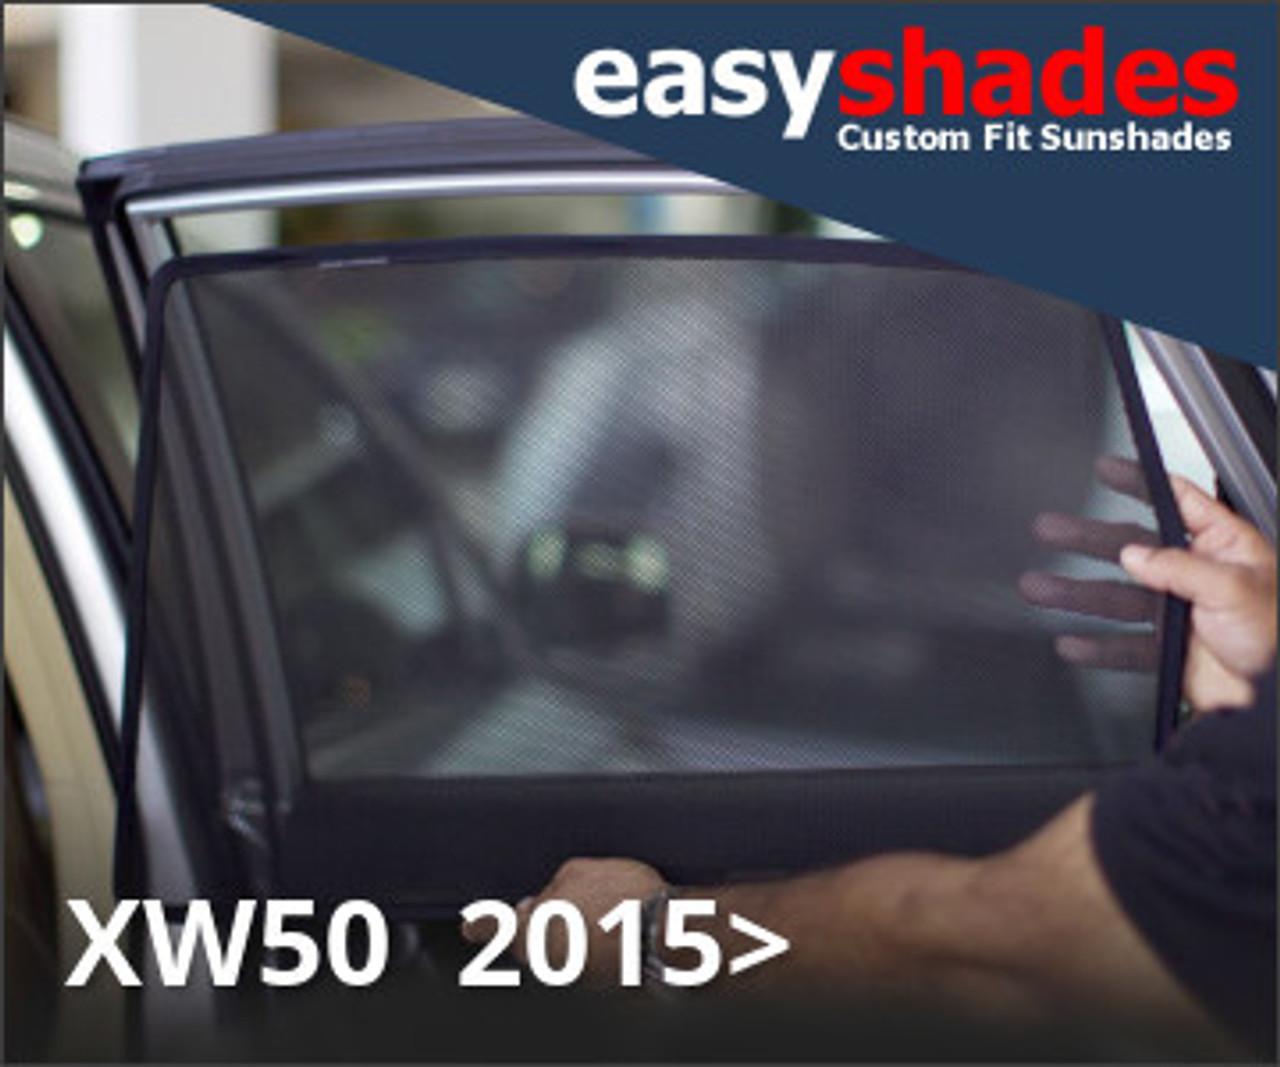 XW50 2015>